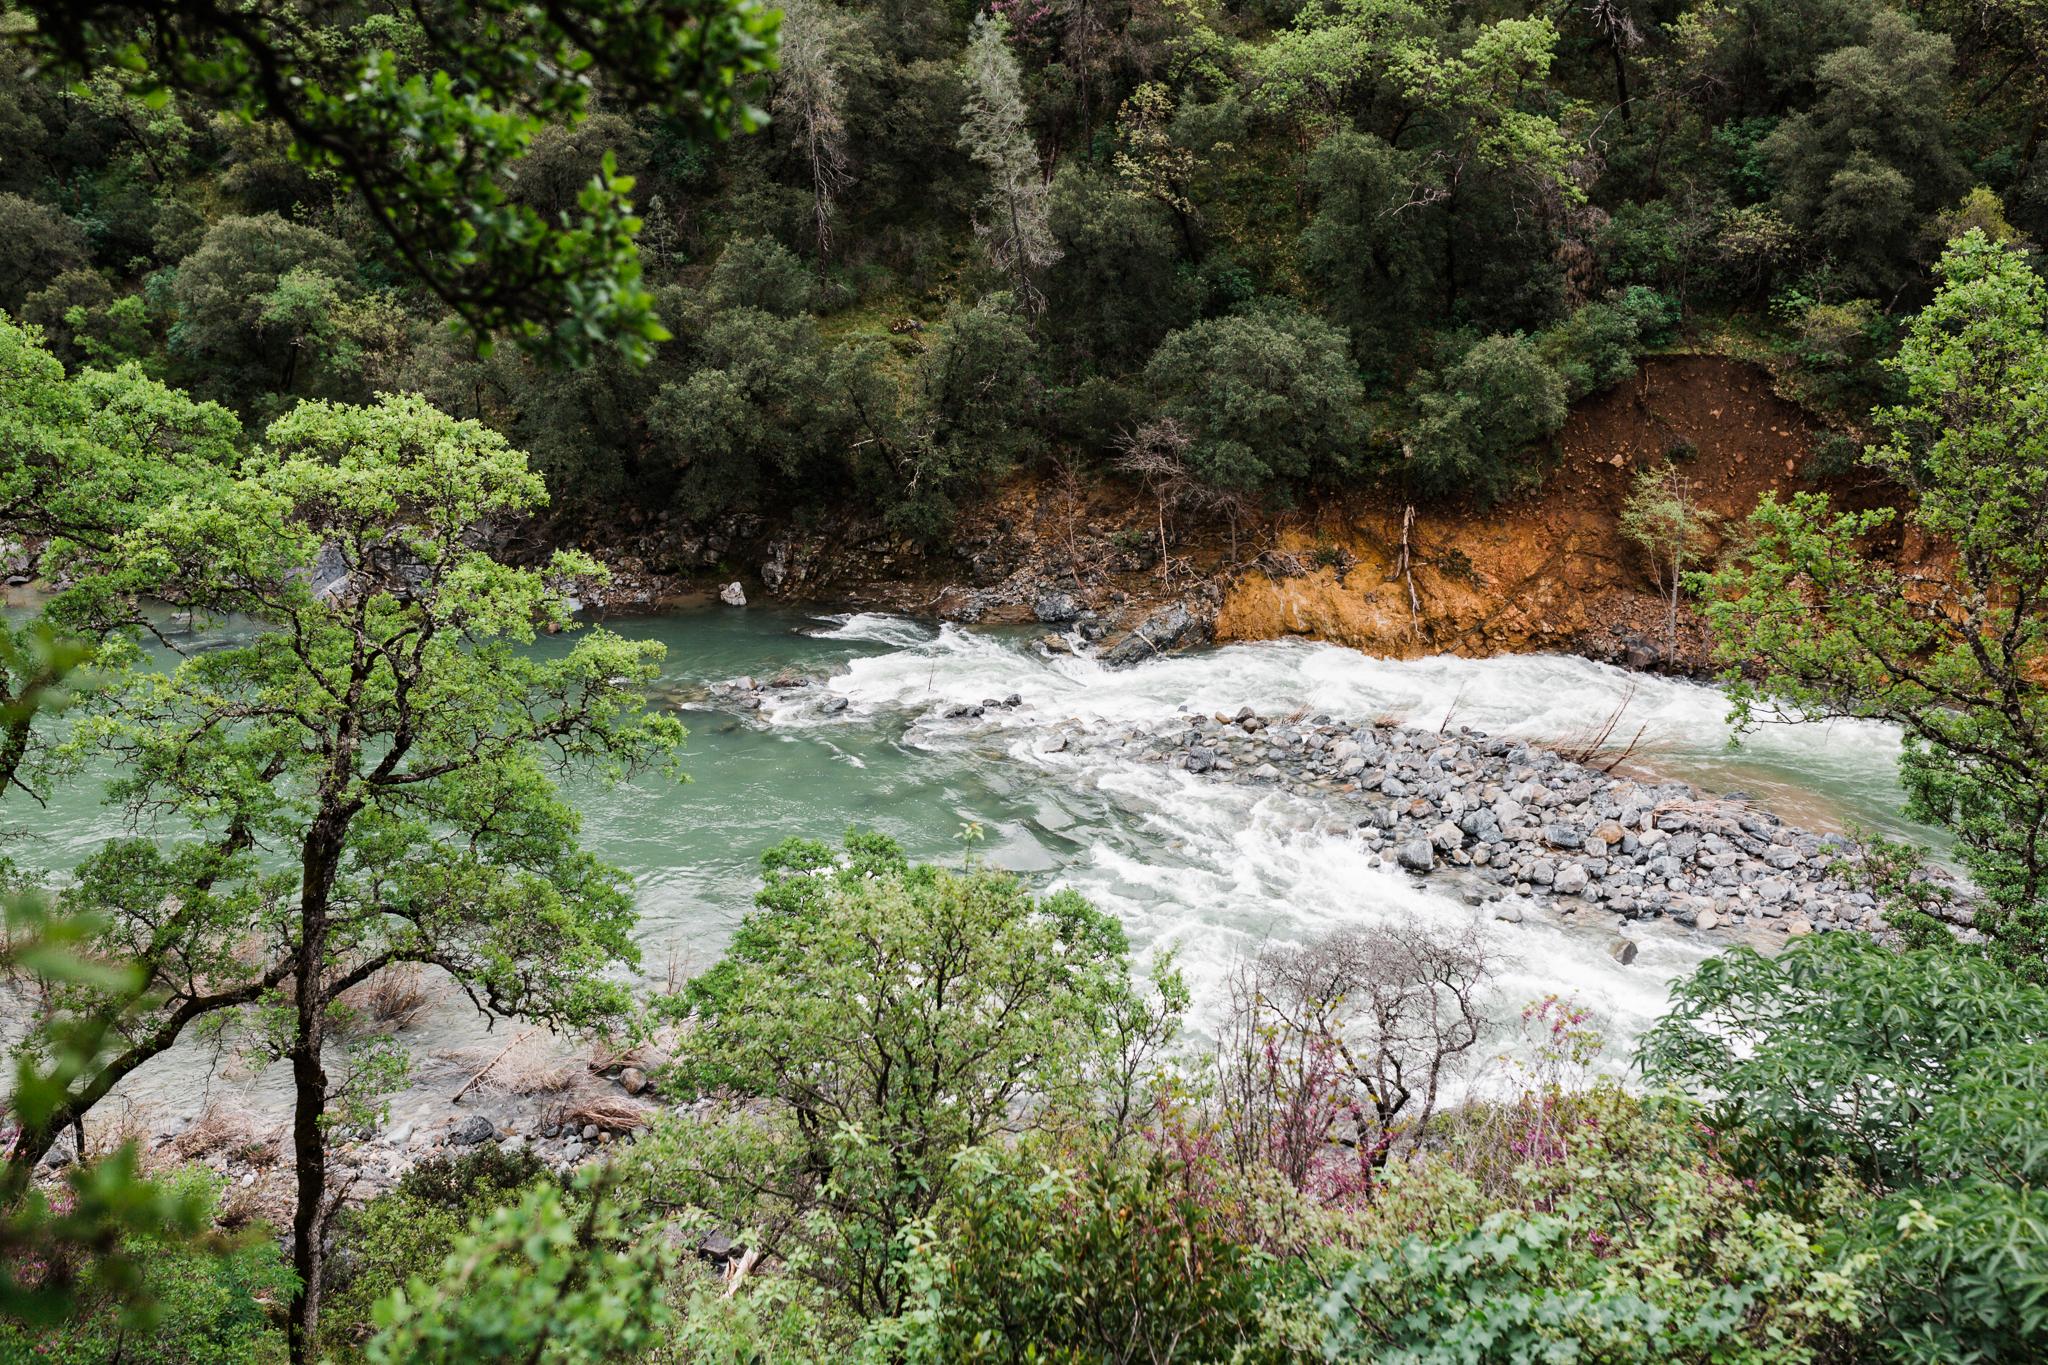 Yuba River | Lenkaland Photography